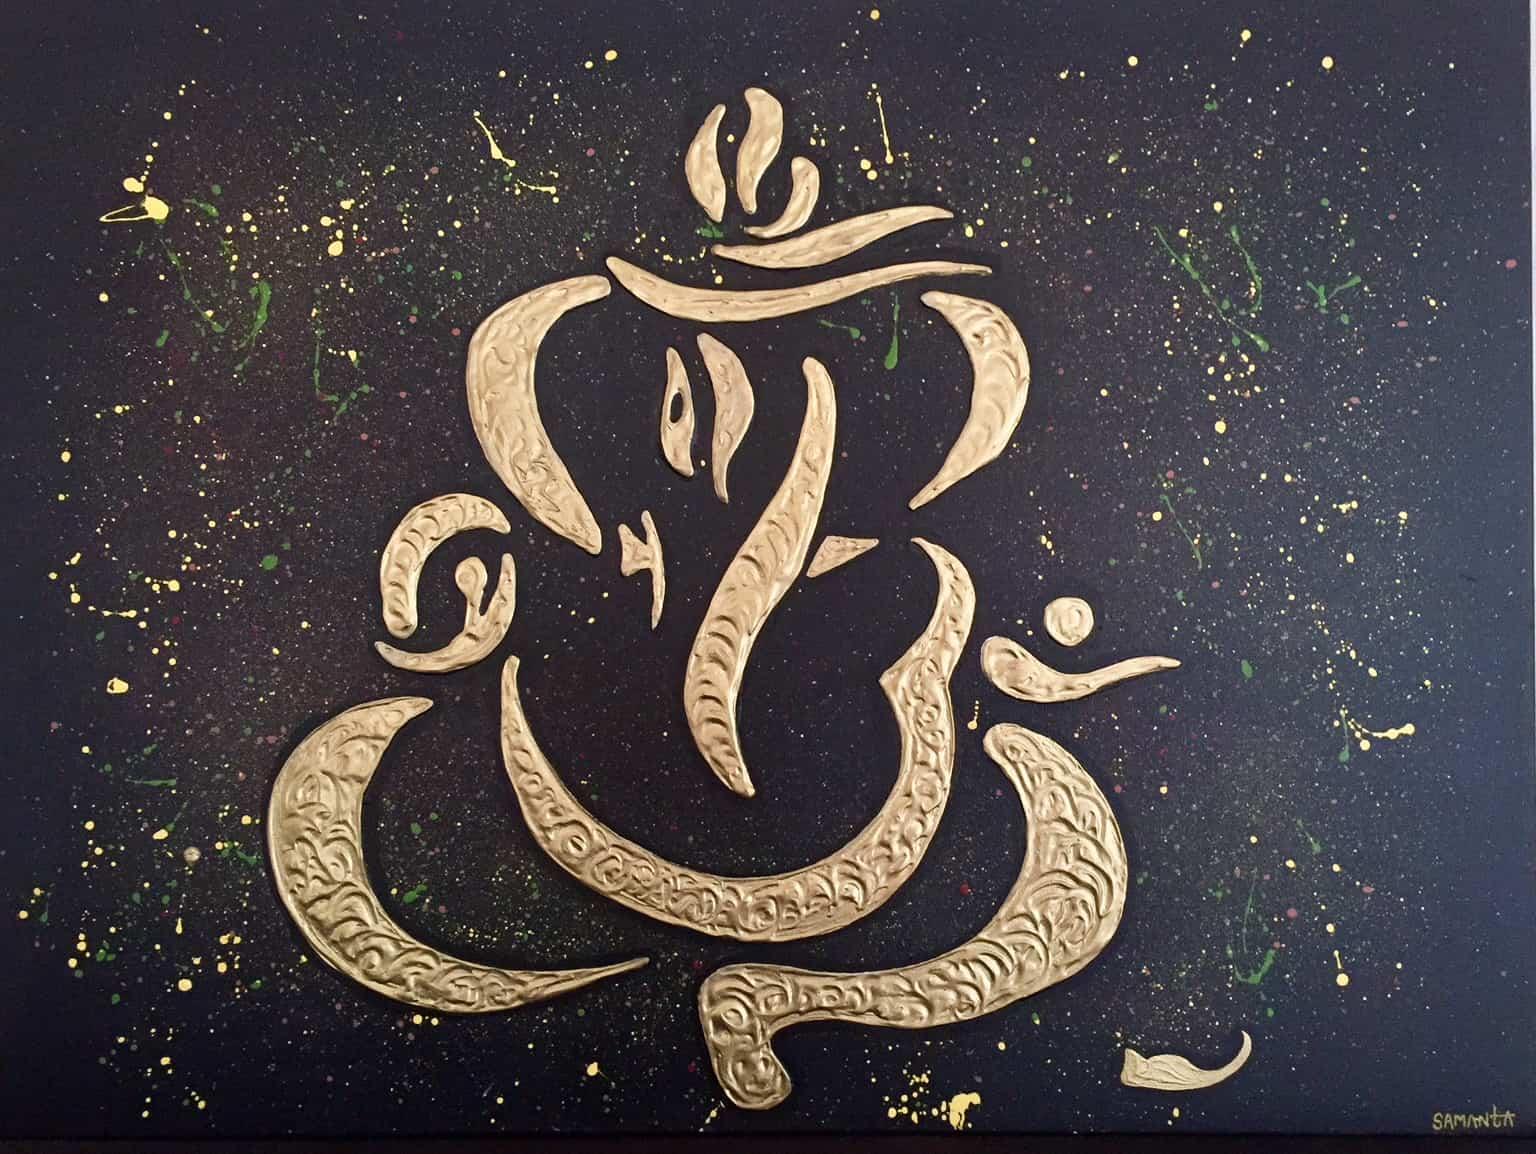 mauritius_arts_samanta_bissoondyal-divine-ganesh